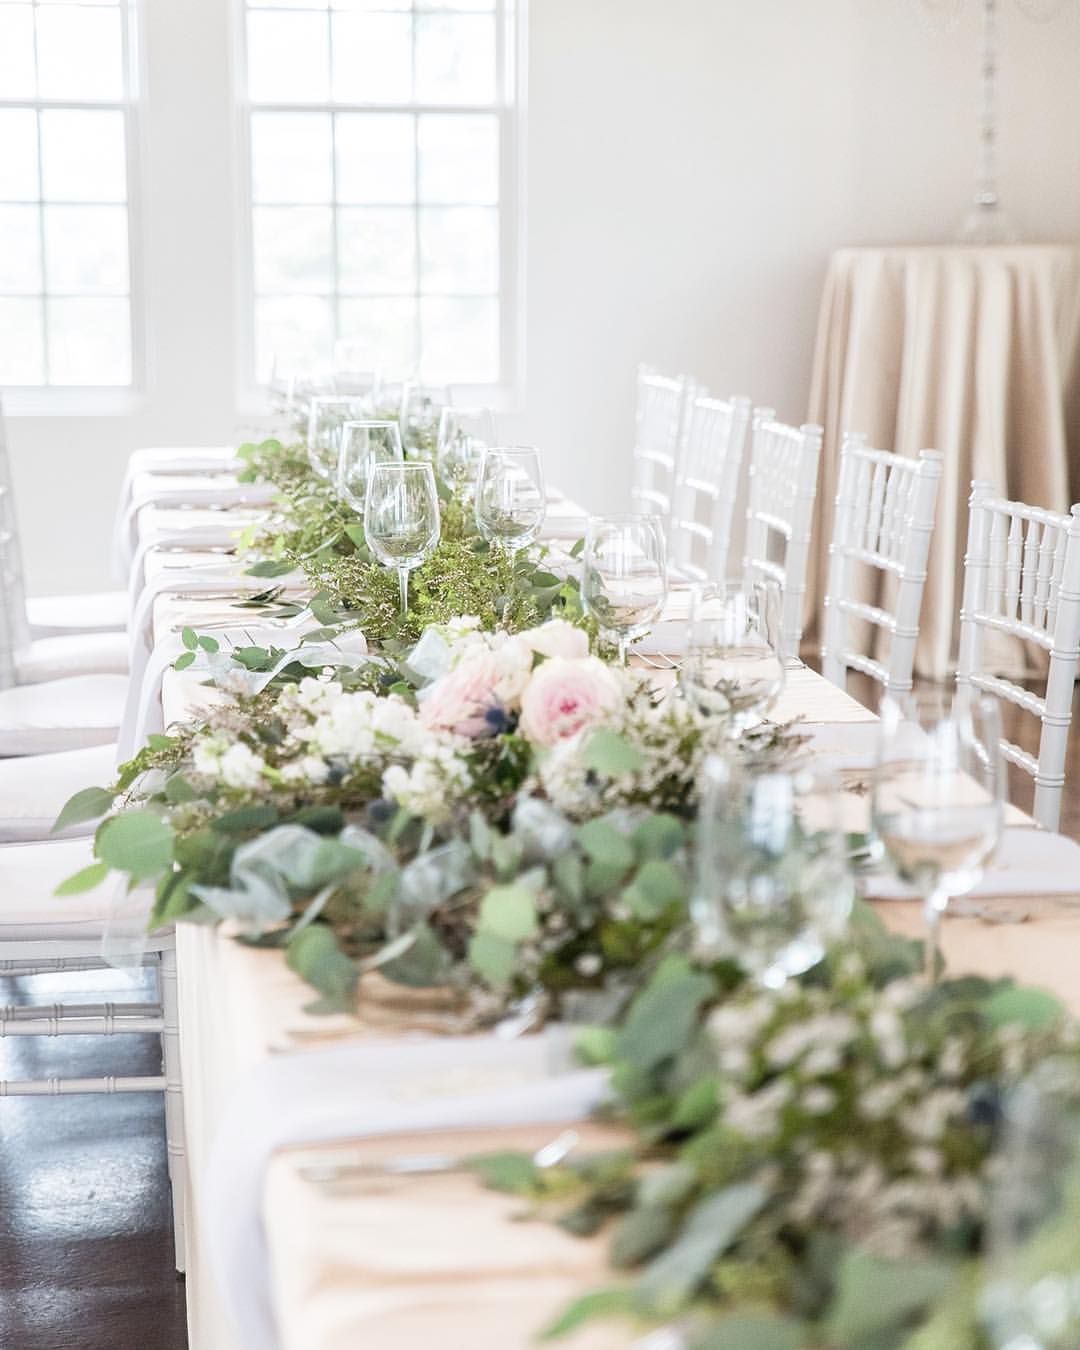 Wedding table decor ideas | lady Ilg Photography | Real Weddings ...